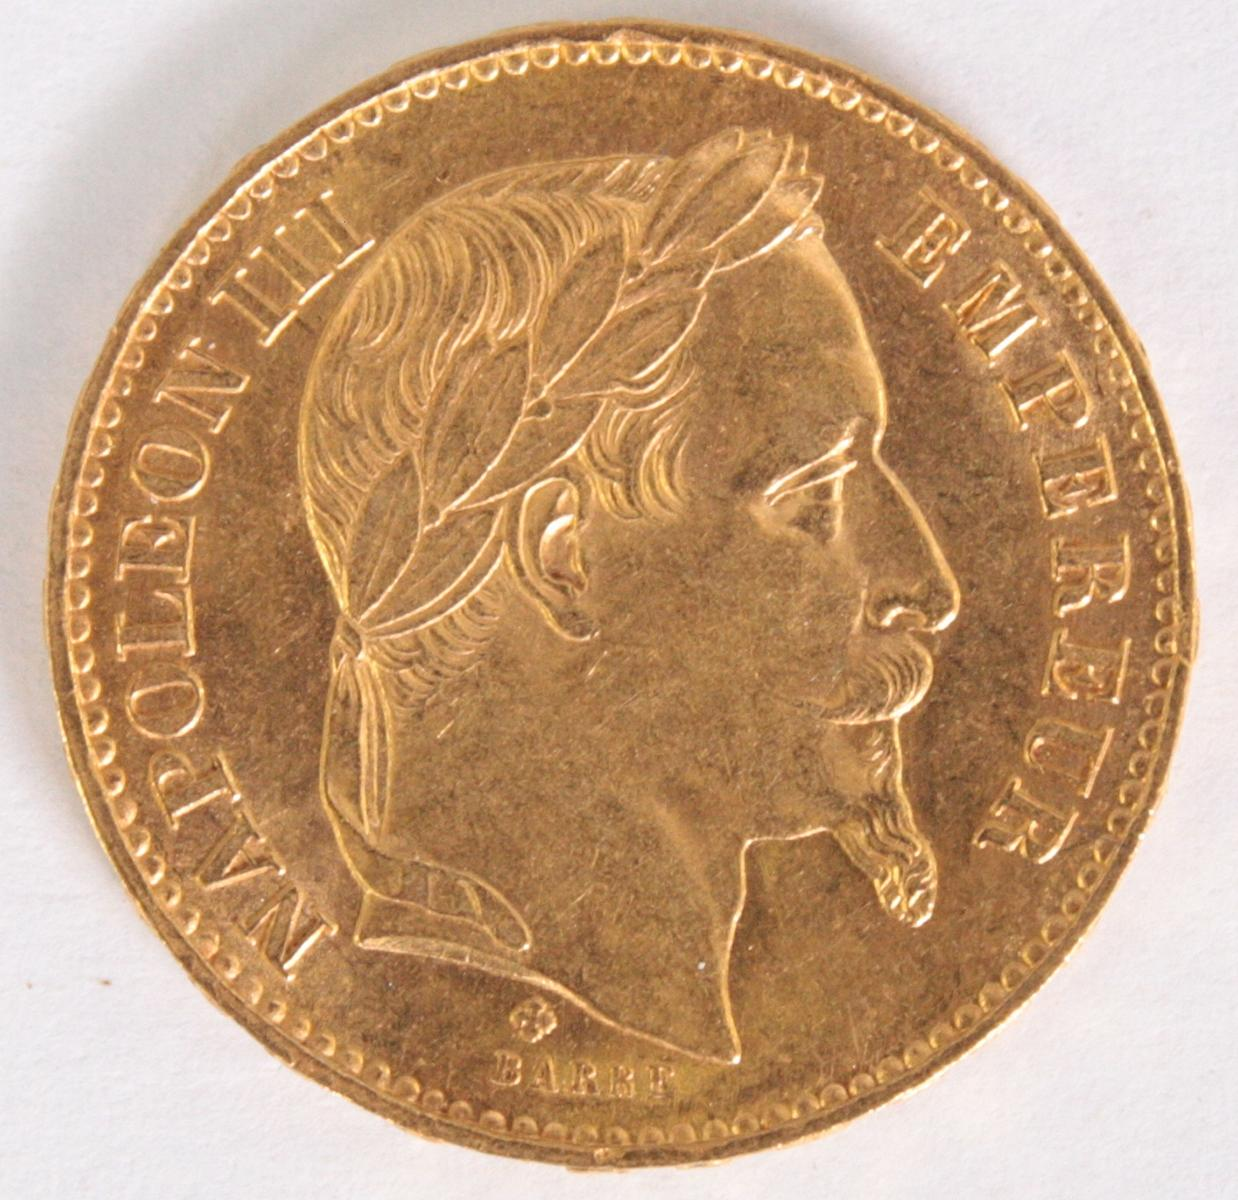 Frankreich, 20 Francs 1869, Napoleon III